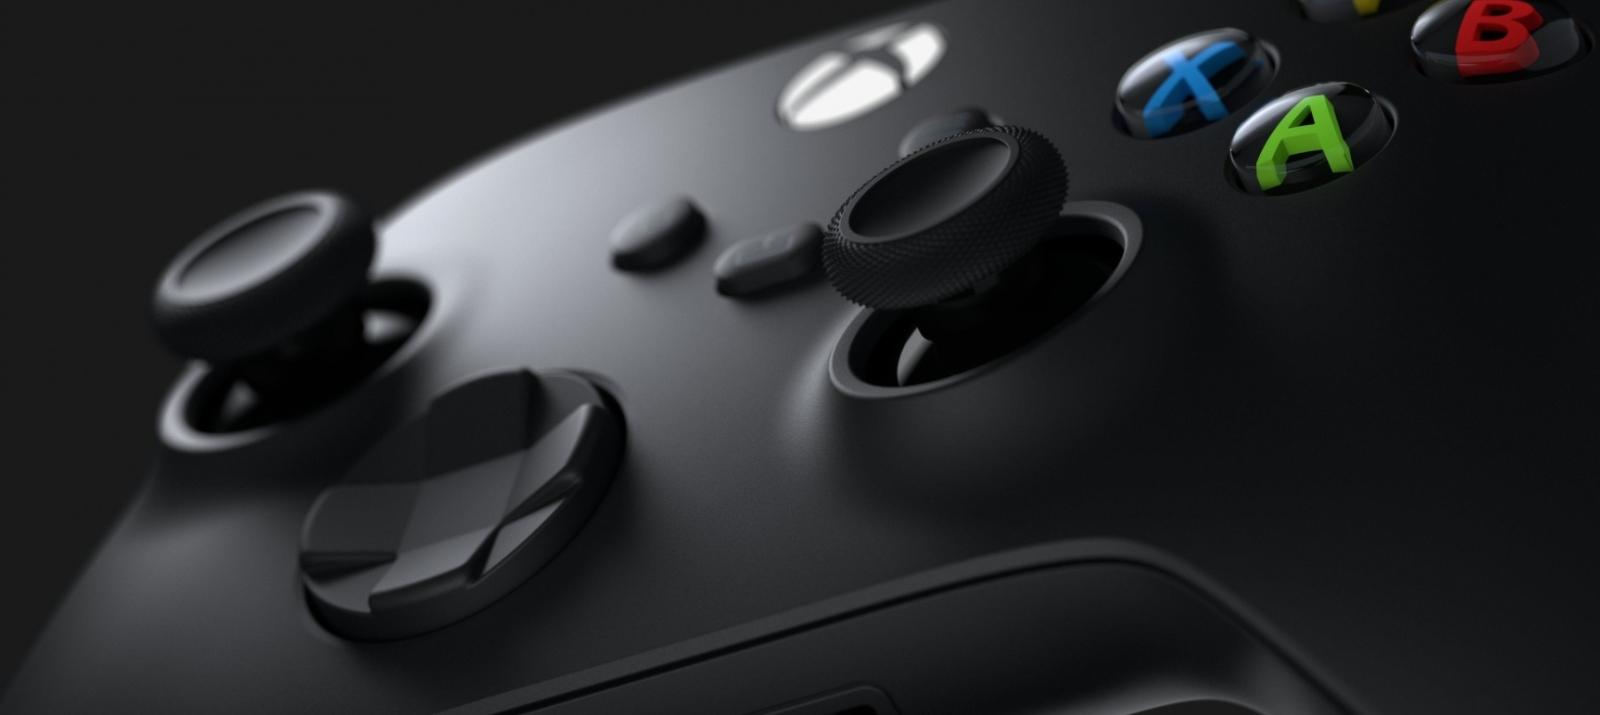 Вот так выглядят внутренности контроллера Xbox Series X